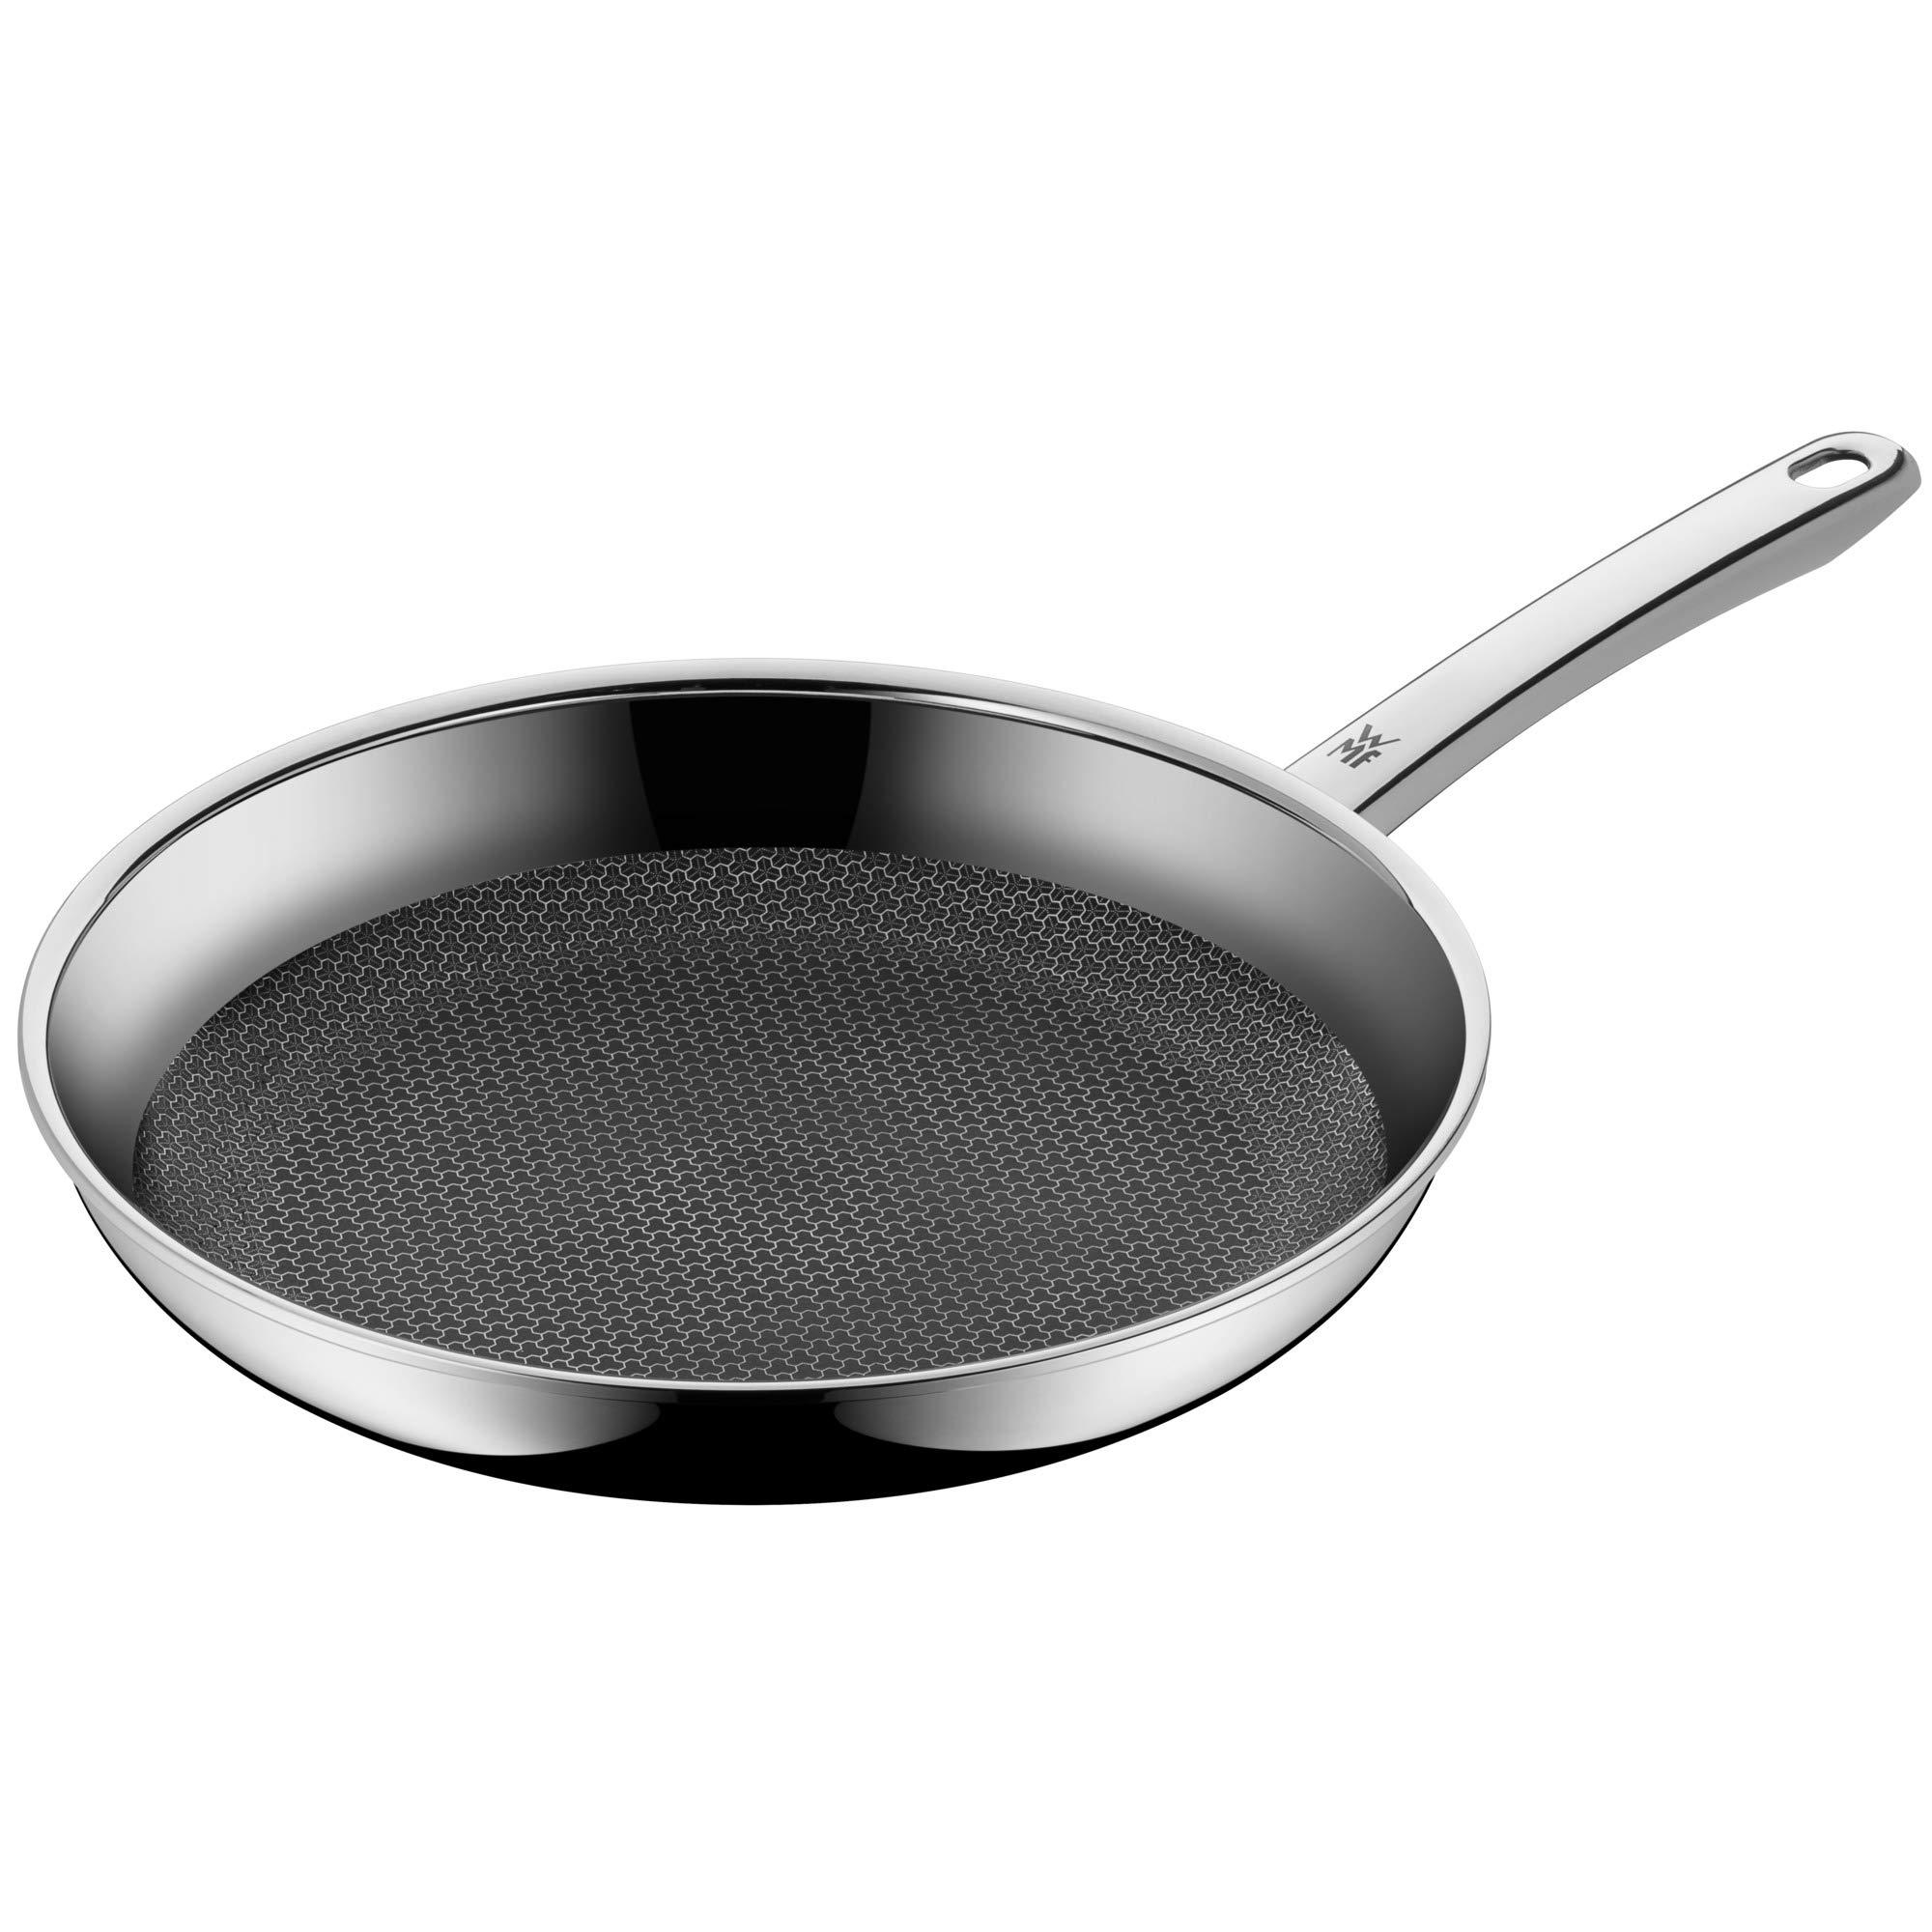 Wmf Profiresist 11 Frying Pan